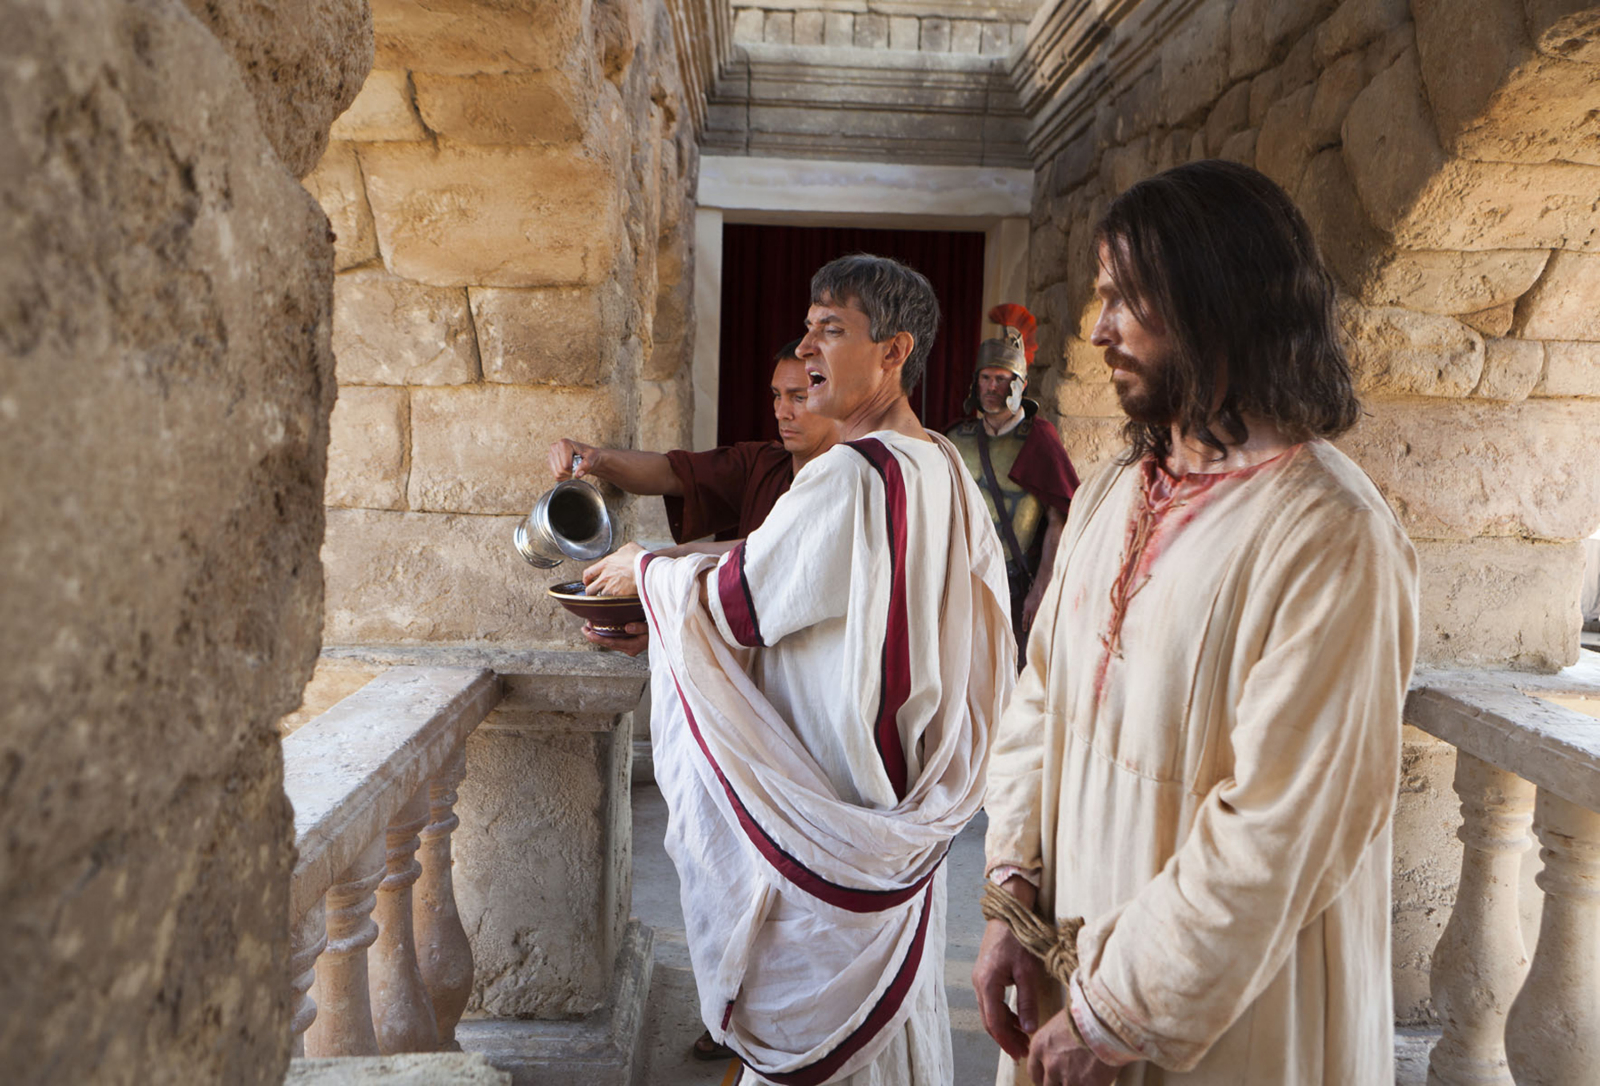 I saw jesus die - 1 3